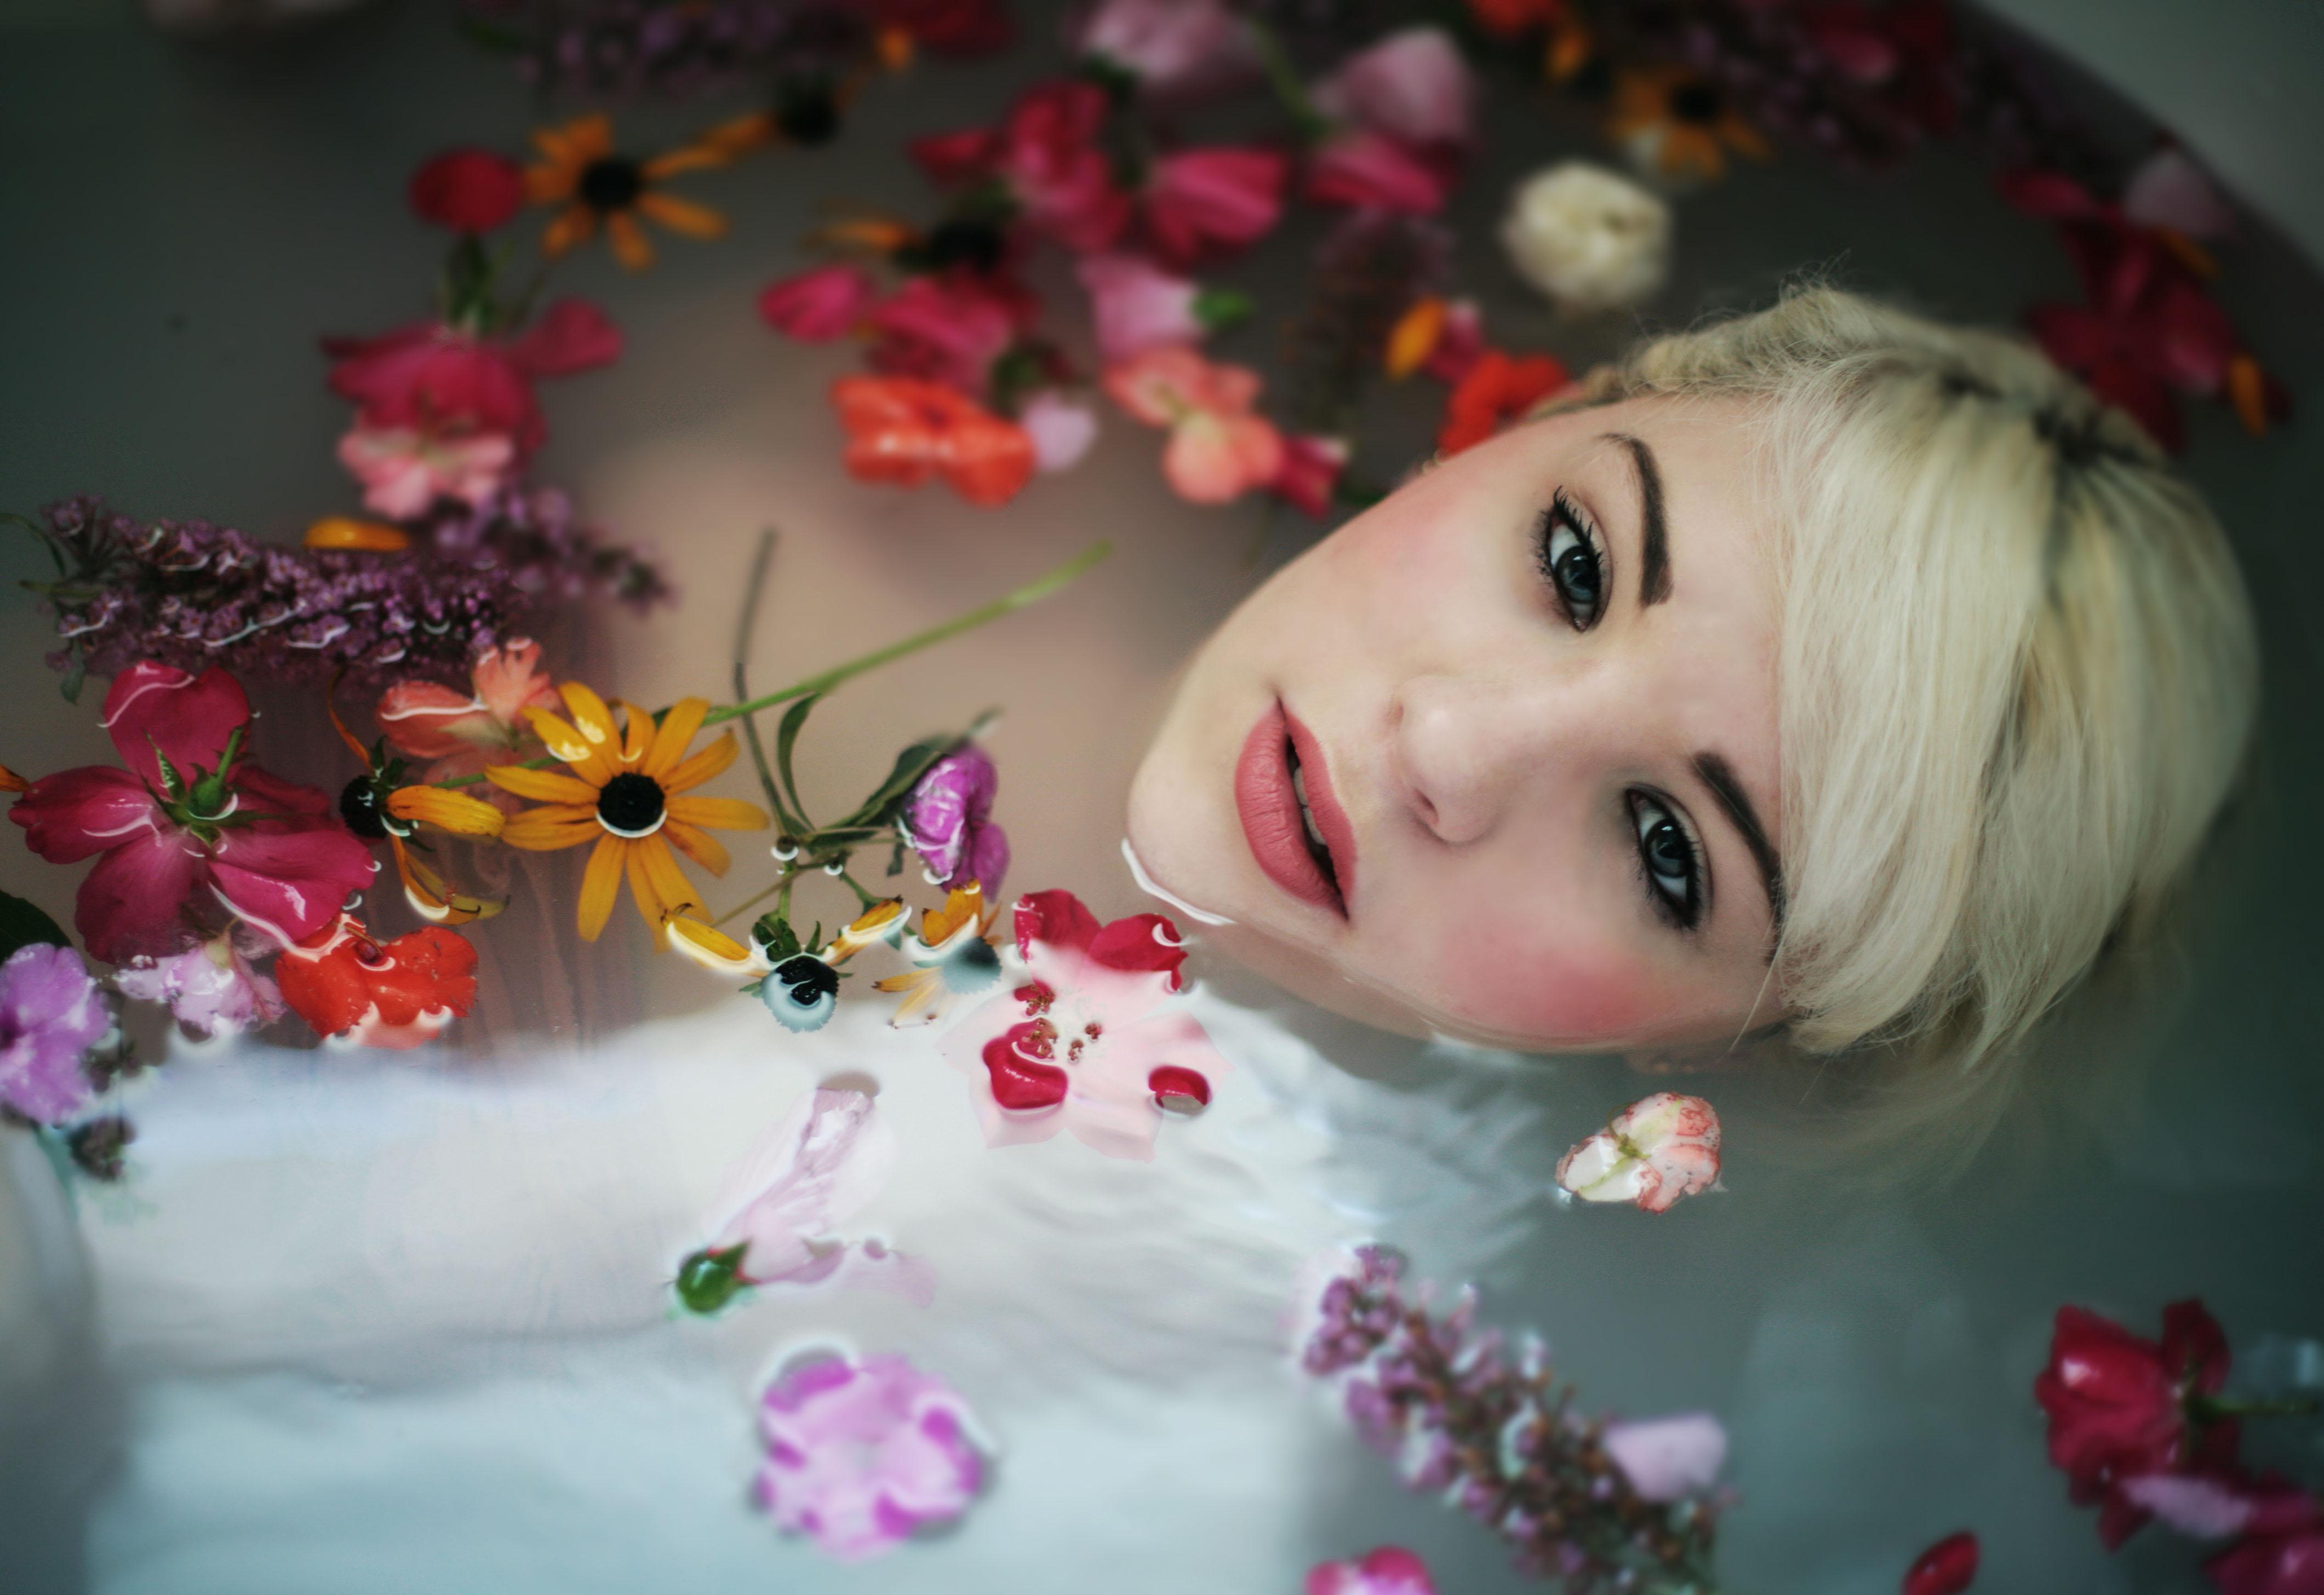 Vasca Da Bagno Rosa : Sfondi bianca bionda occhi fiori rosso blu canone capelli